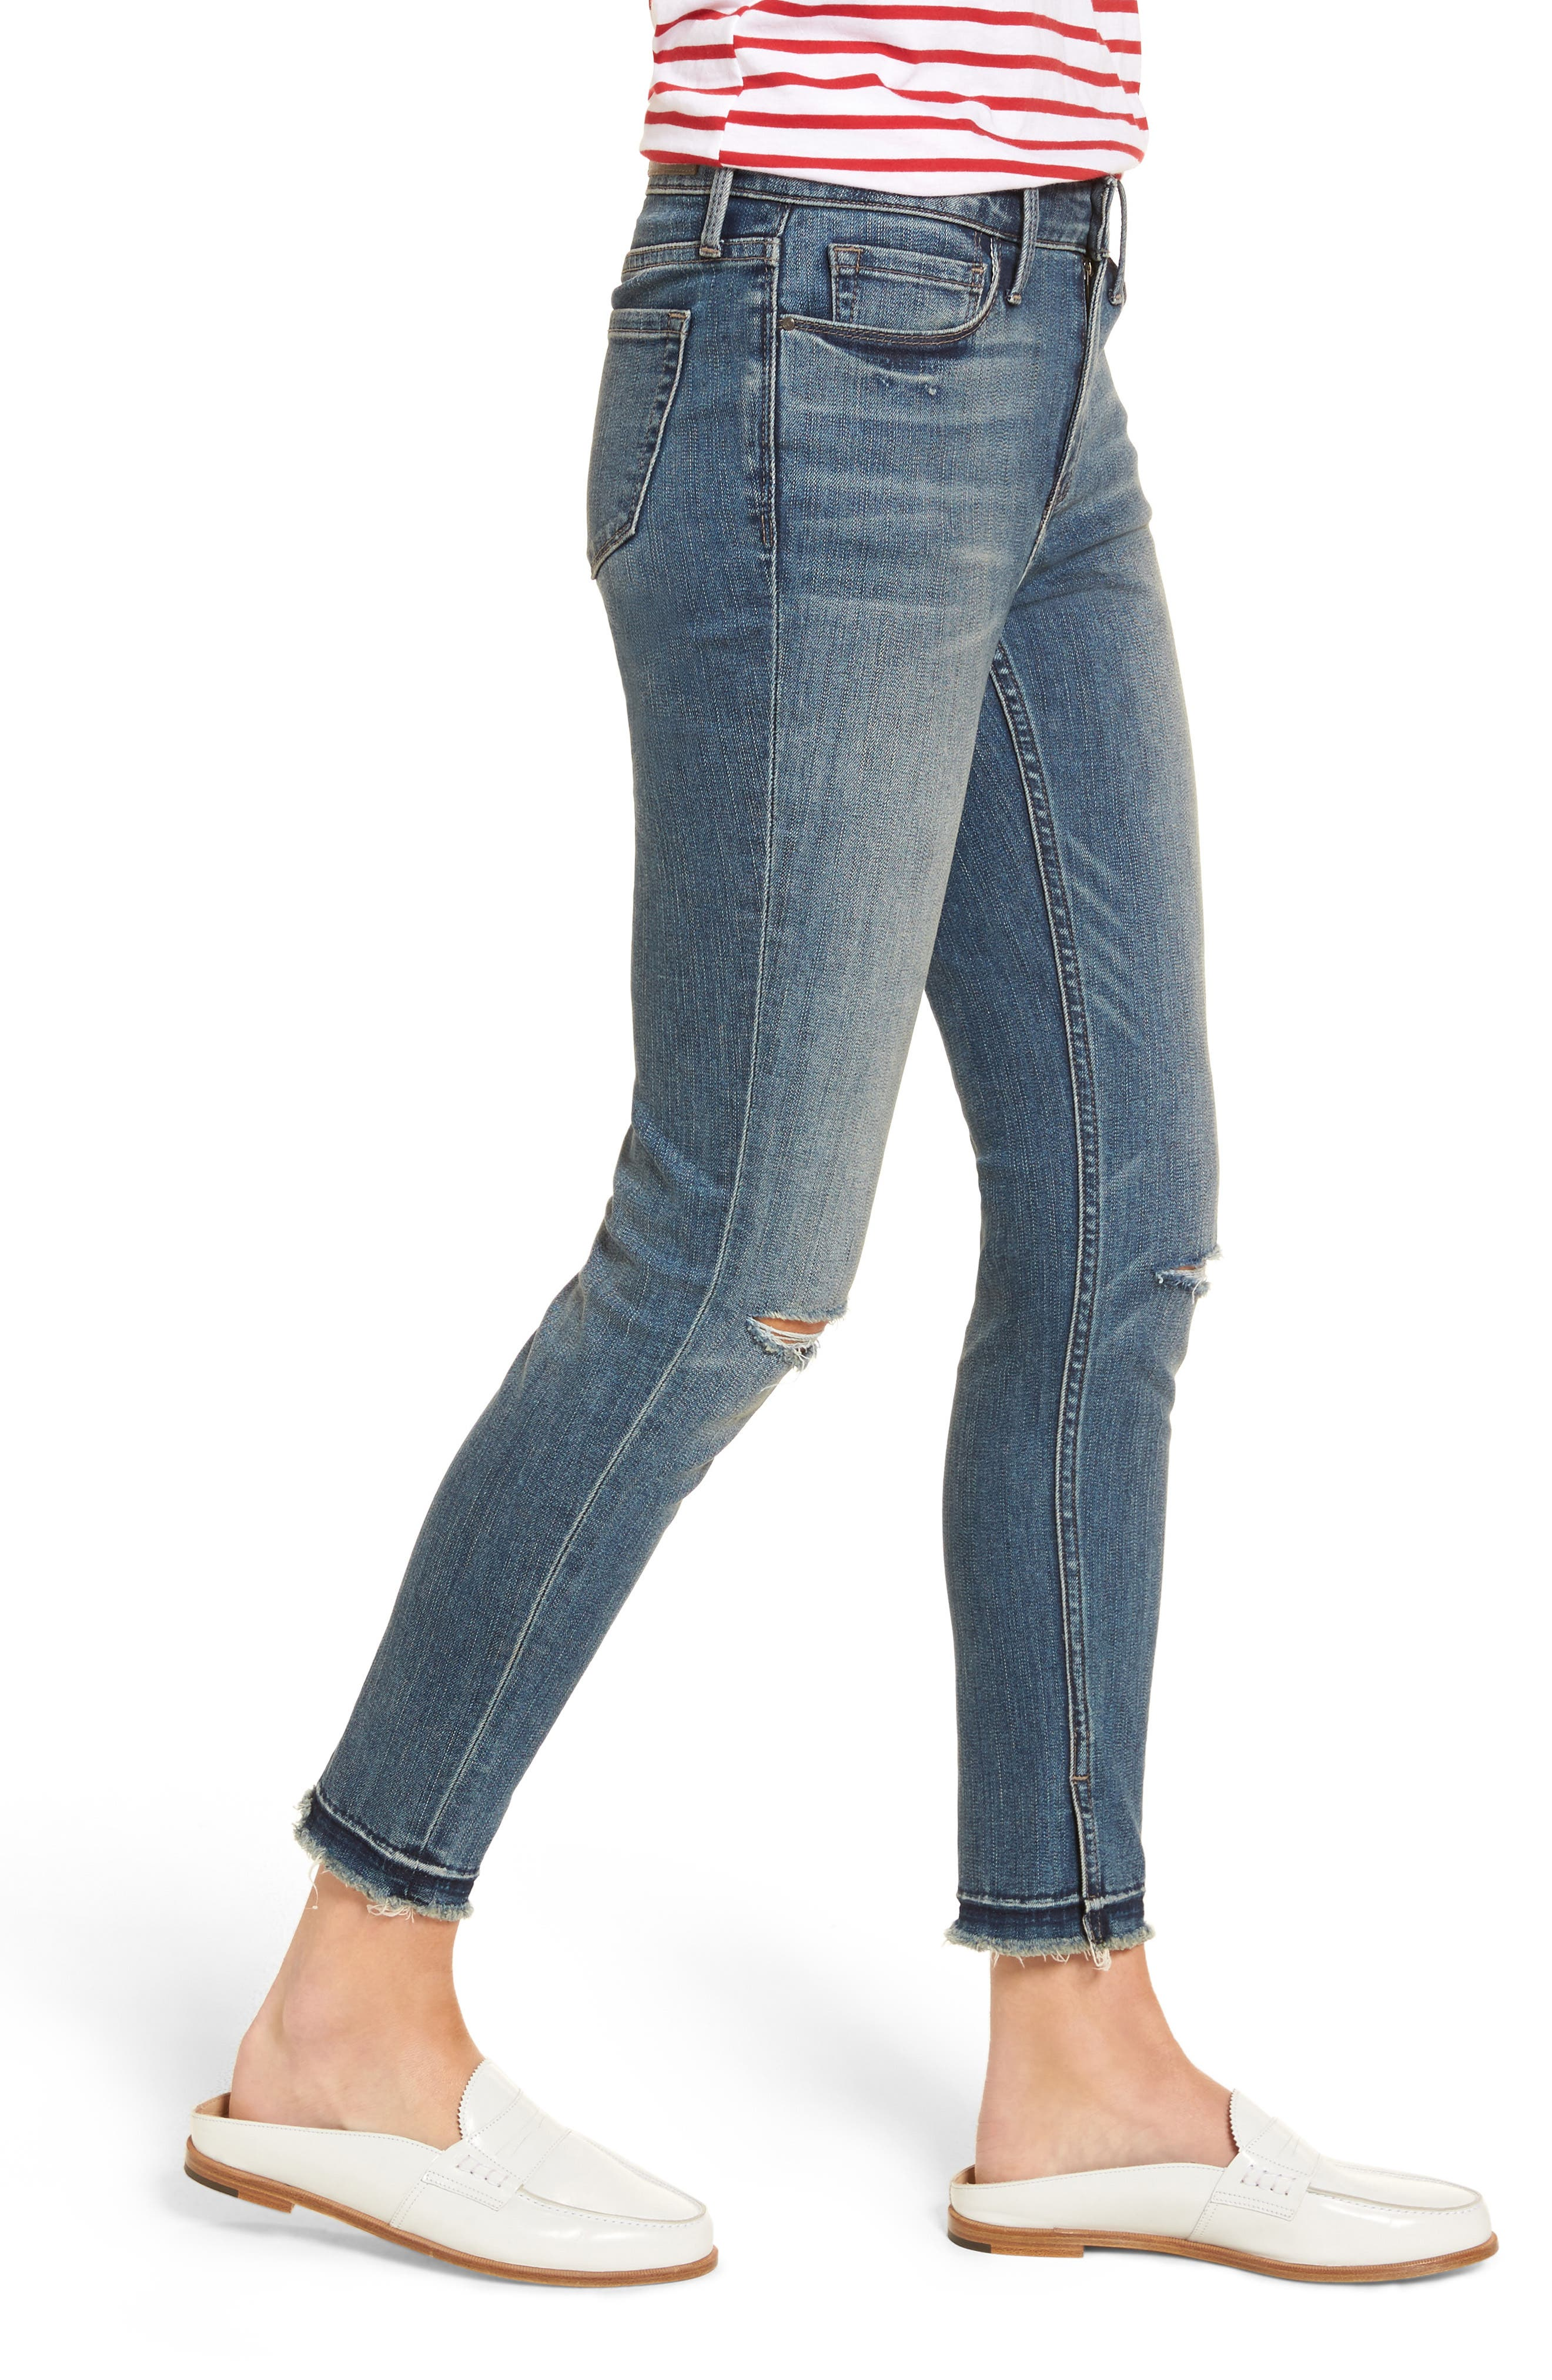 Alternate Image 3  - Treasure & Bond Ankle Skinny Jeans (Rain Dusk Destroy)